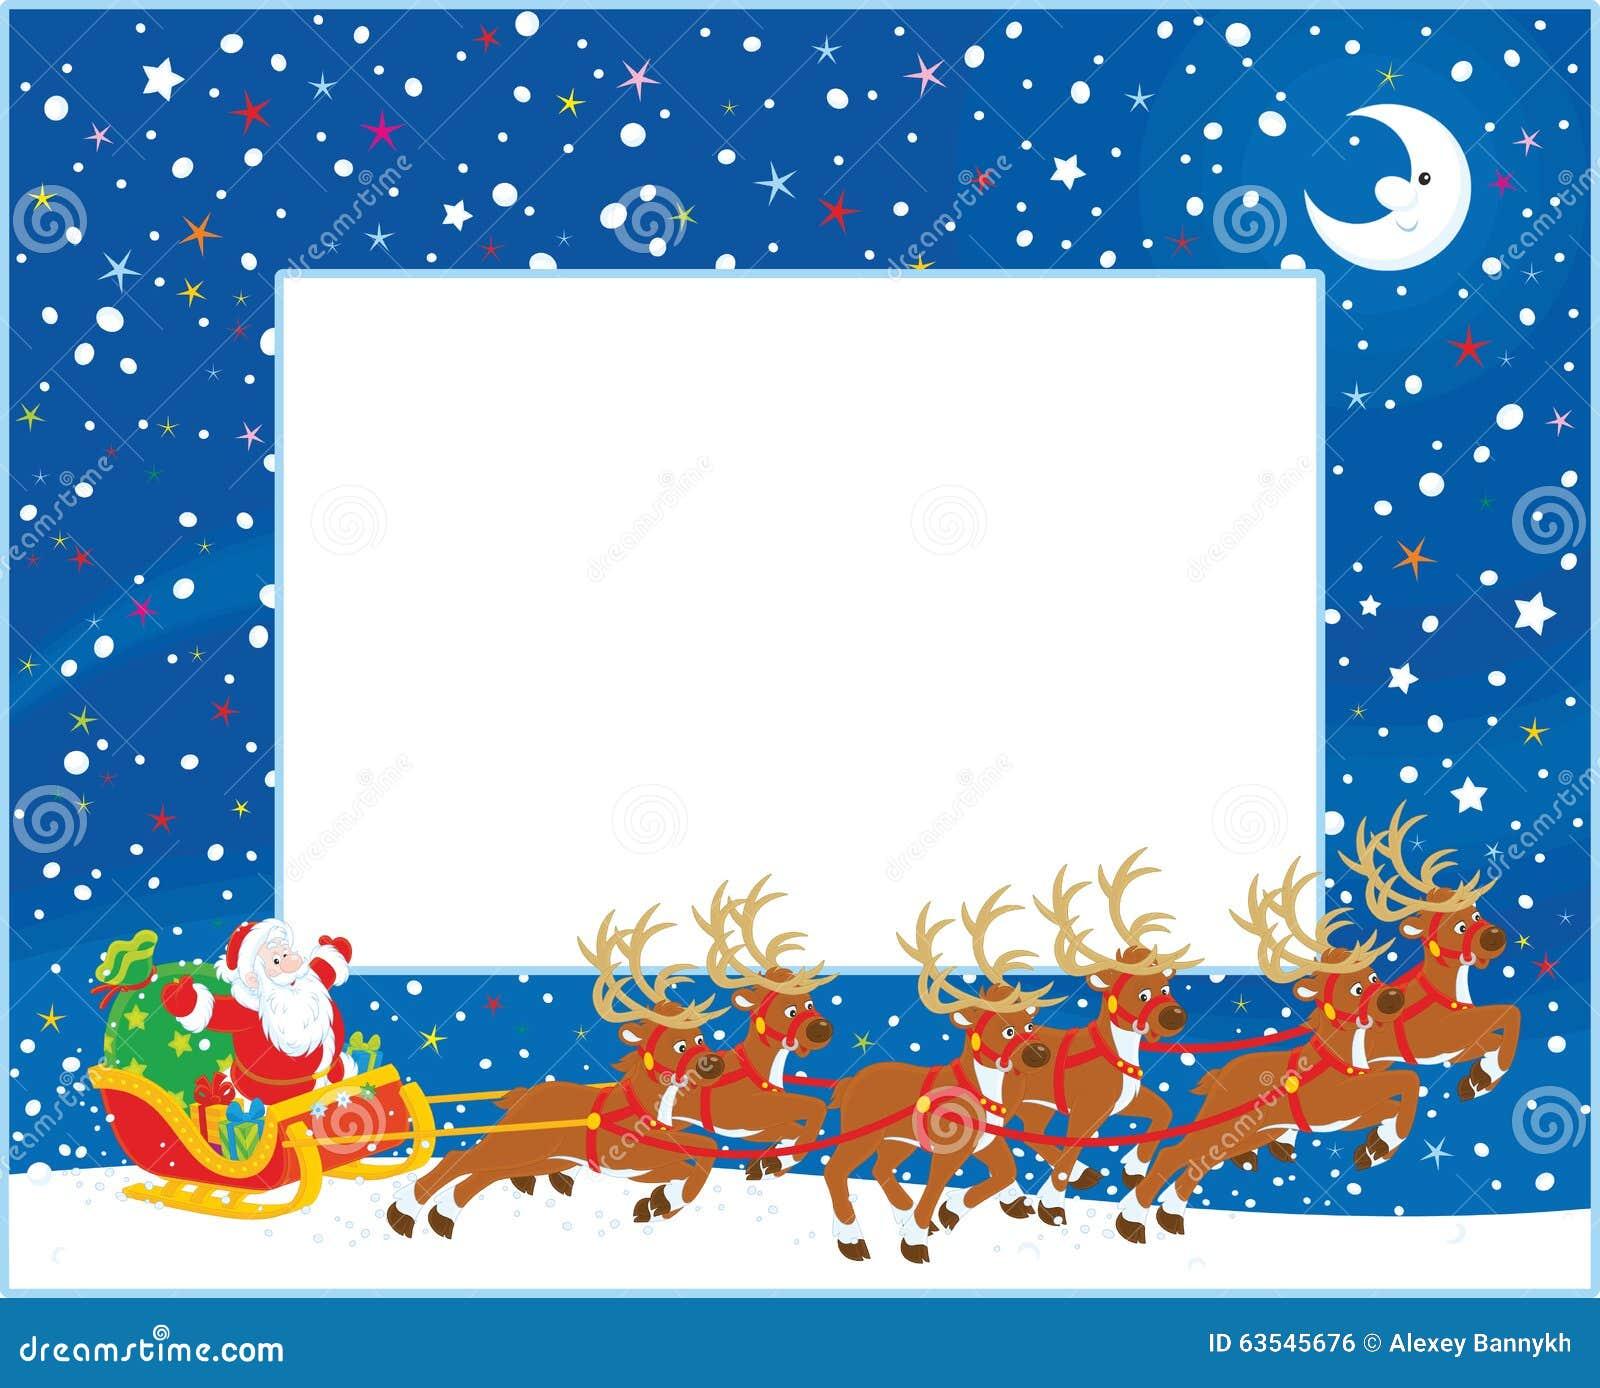 Border With Christmas Sleigh Of Santa Claus Stock Vector ...